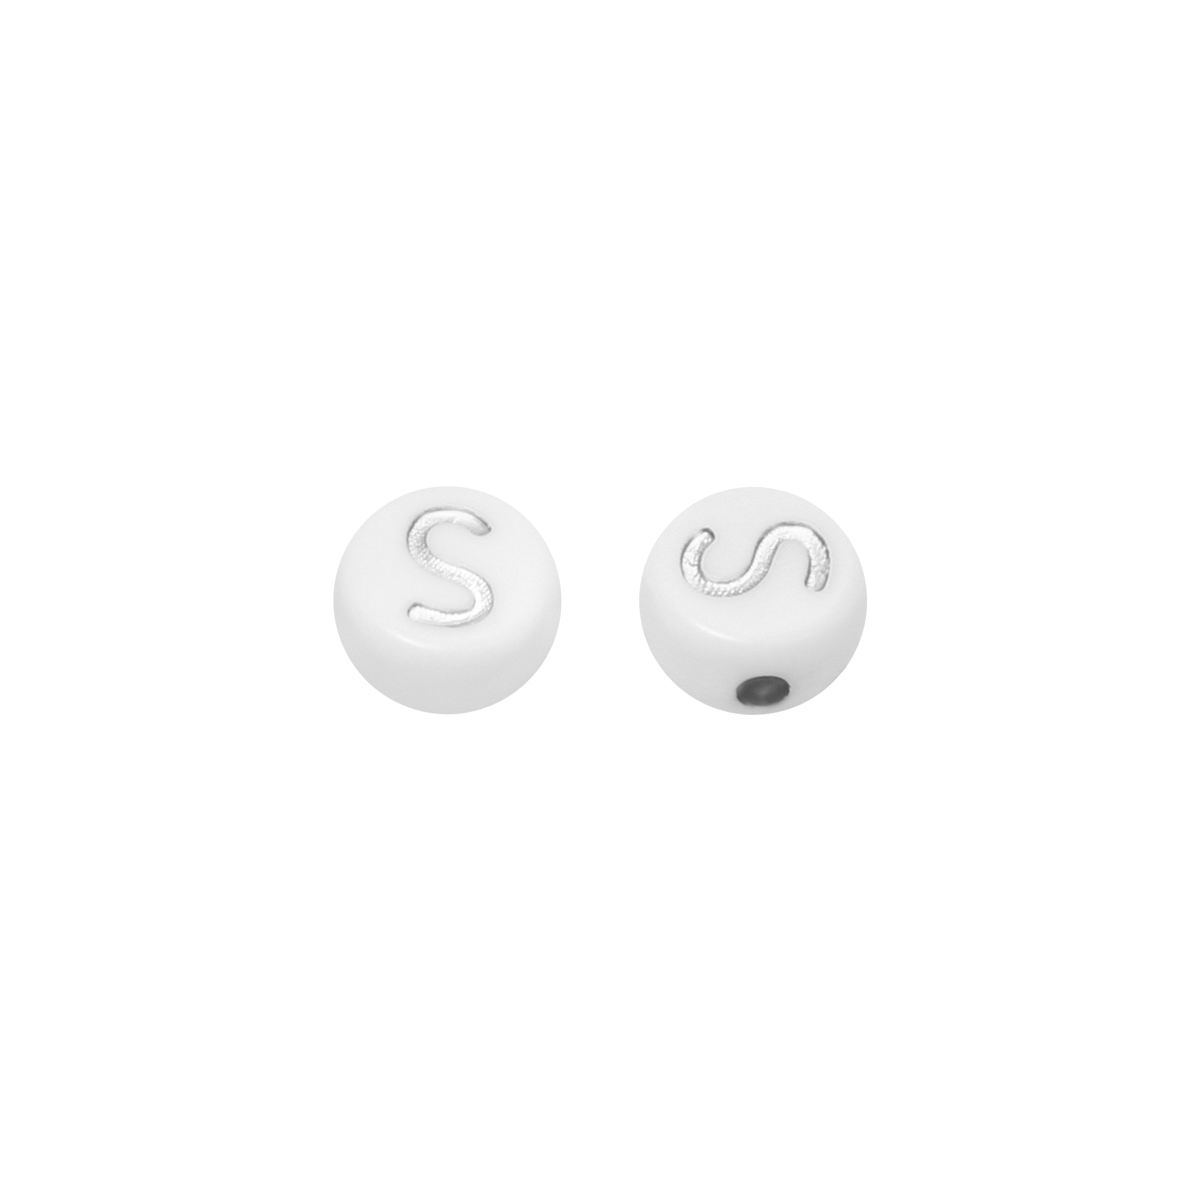 Diy flat beads letter s - 7mm